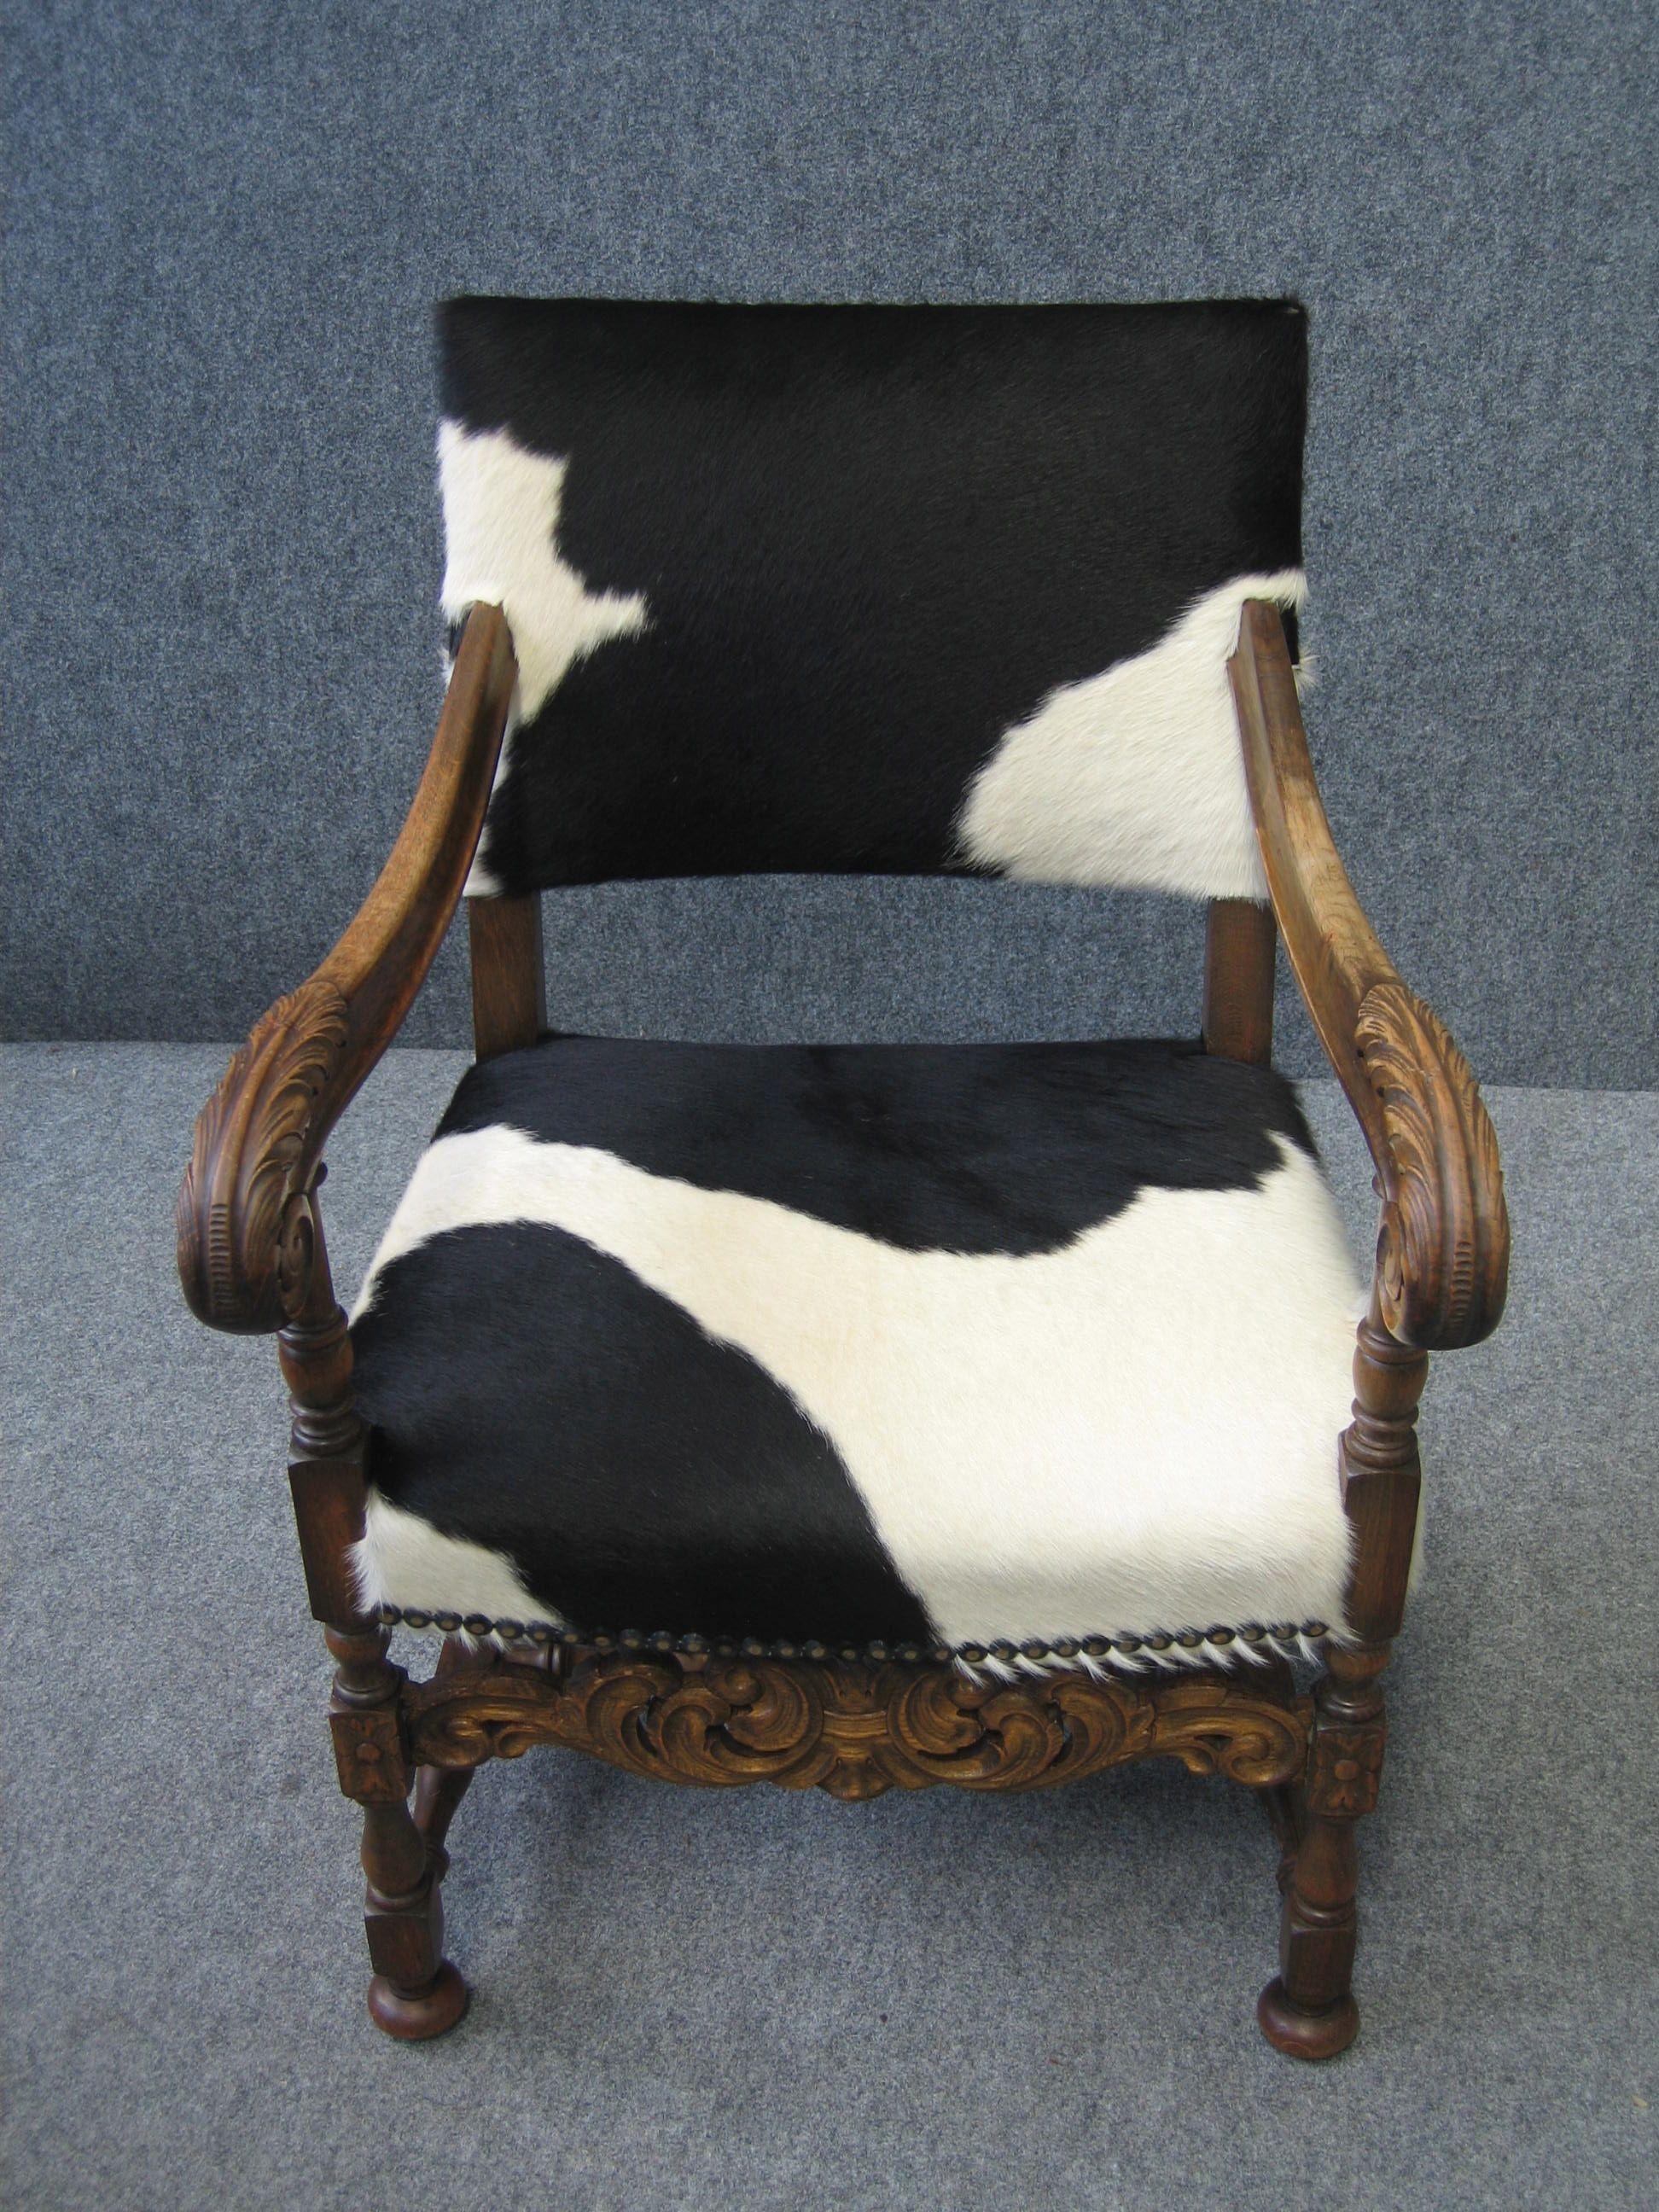 Black And White Cowhide Chair Recliner New Zealand On A Vintage Empire Www Retropiahomewares Com Au